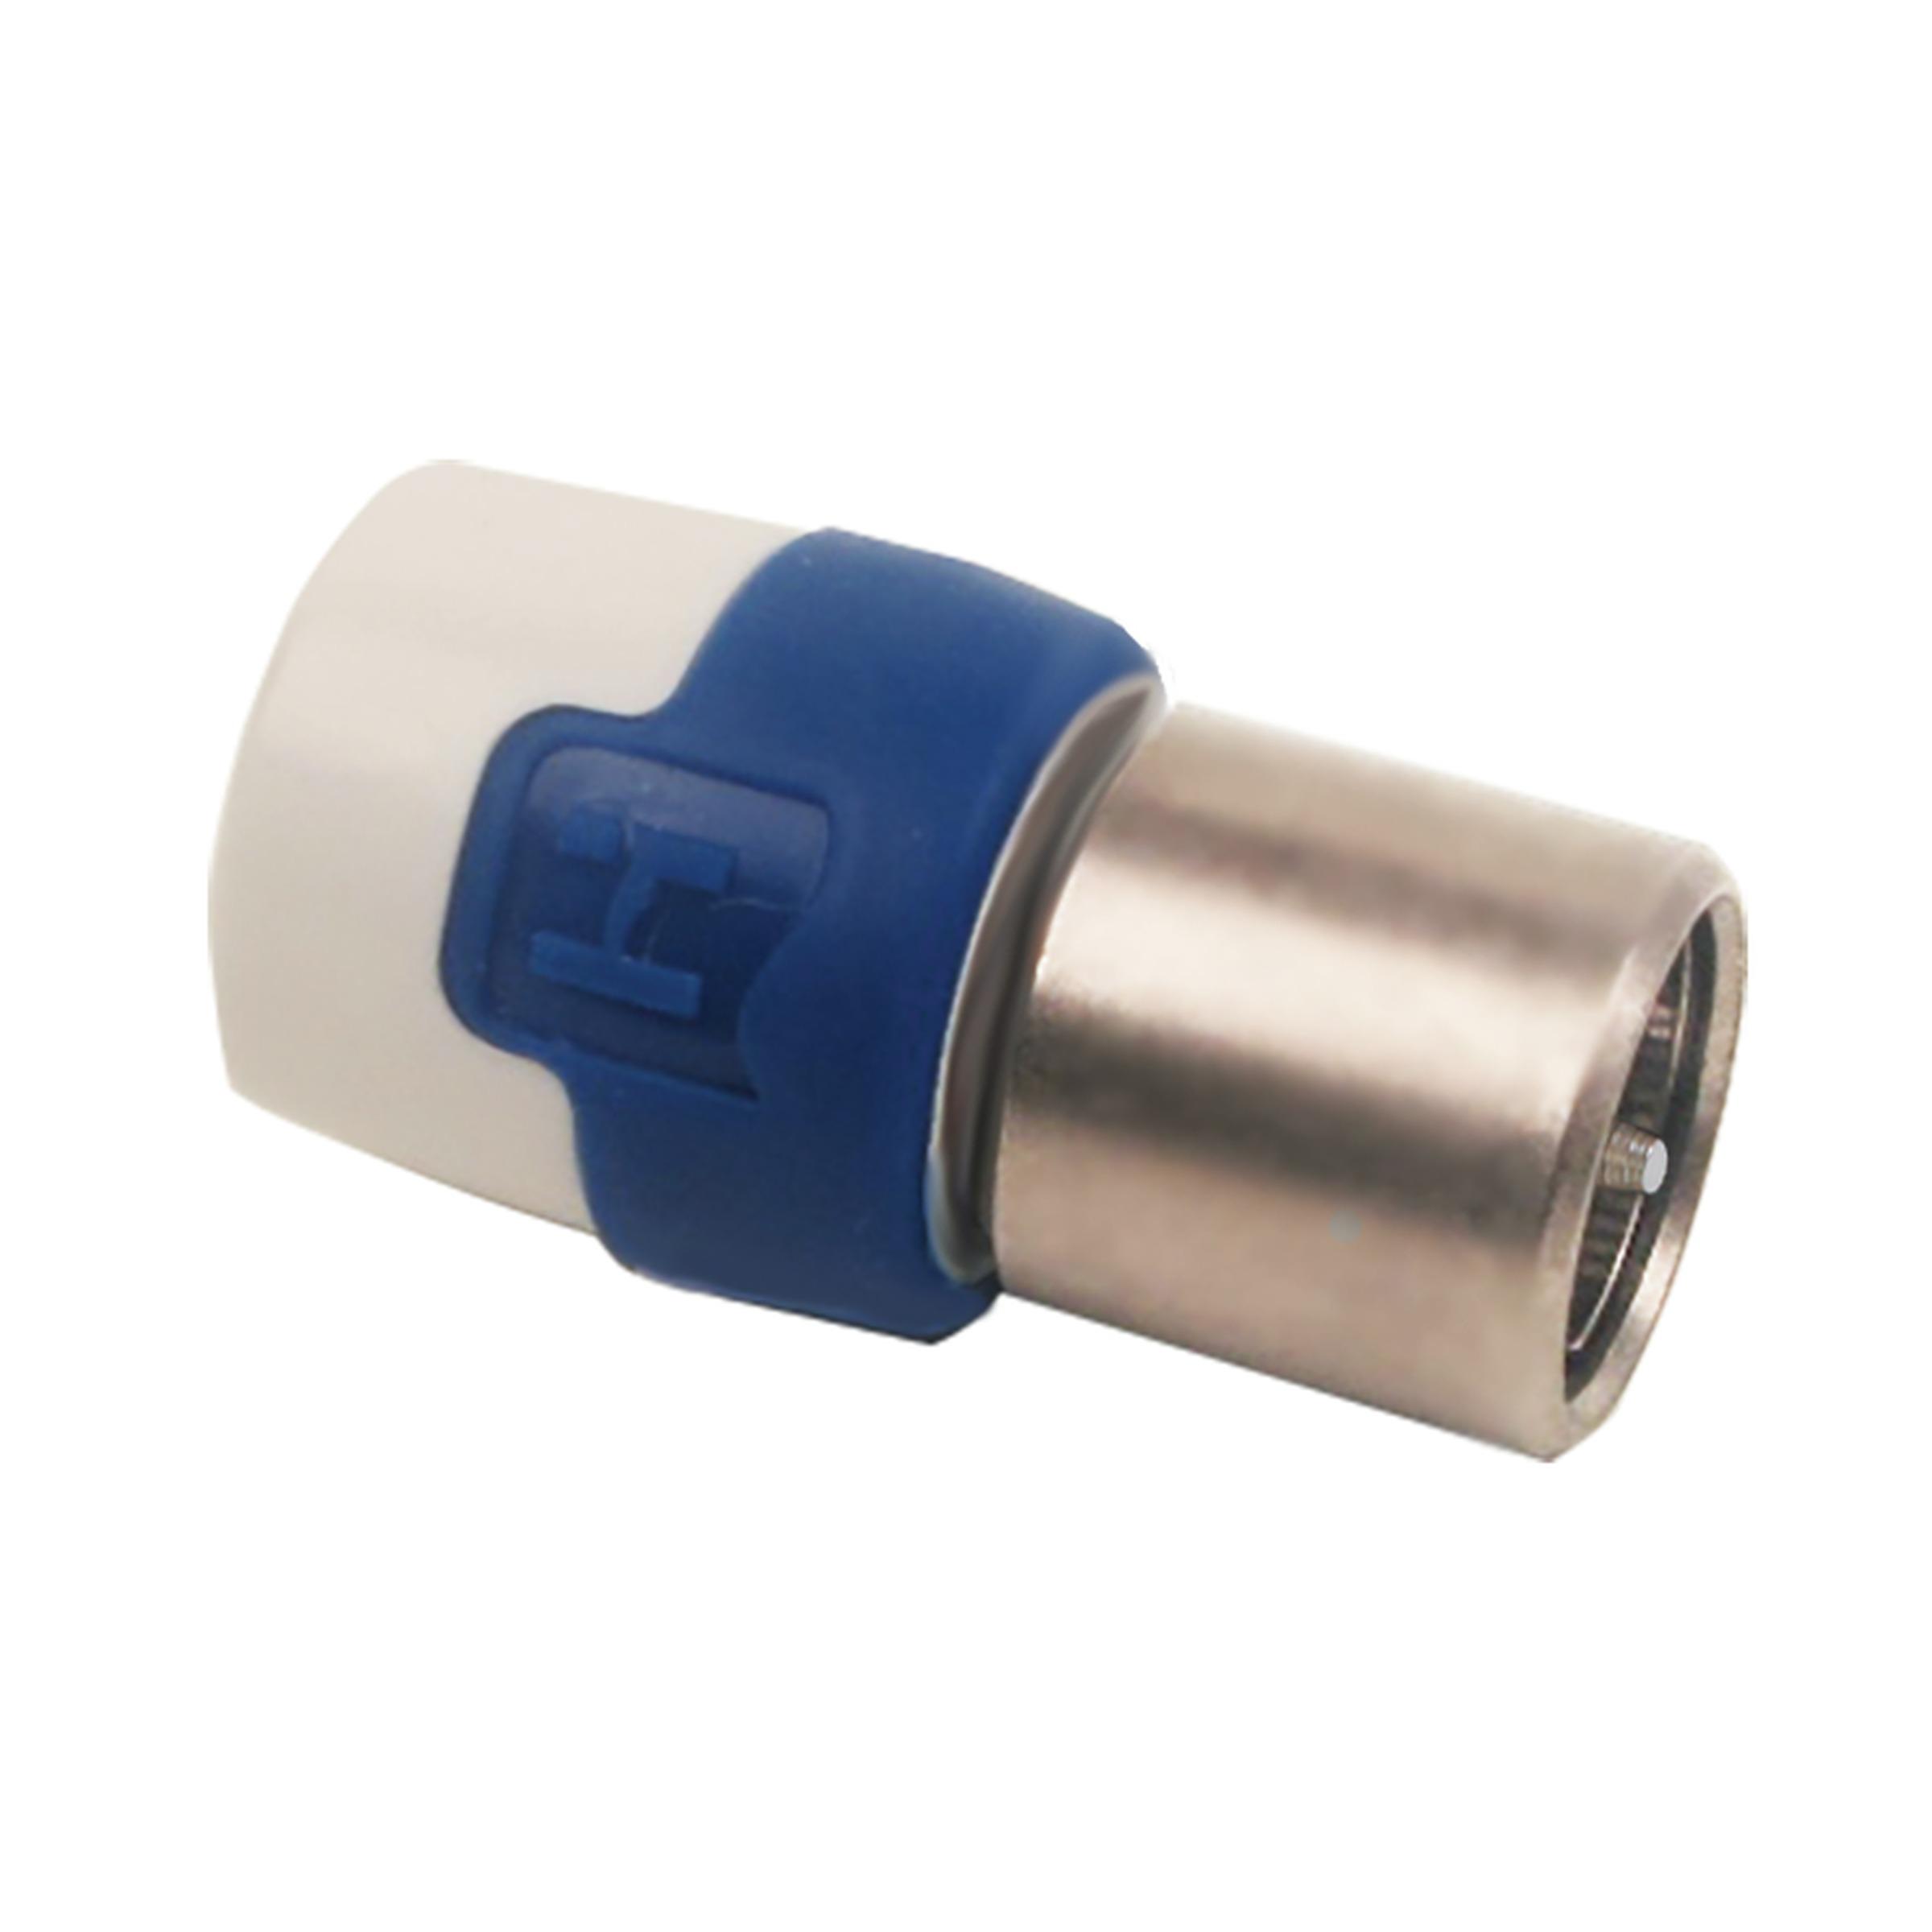 Hirschmann F connector quick fix QFC-5